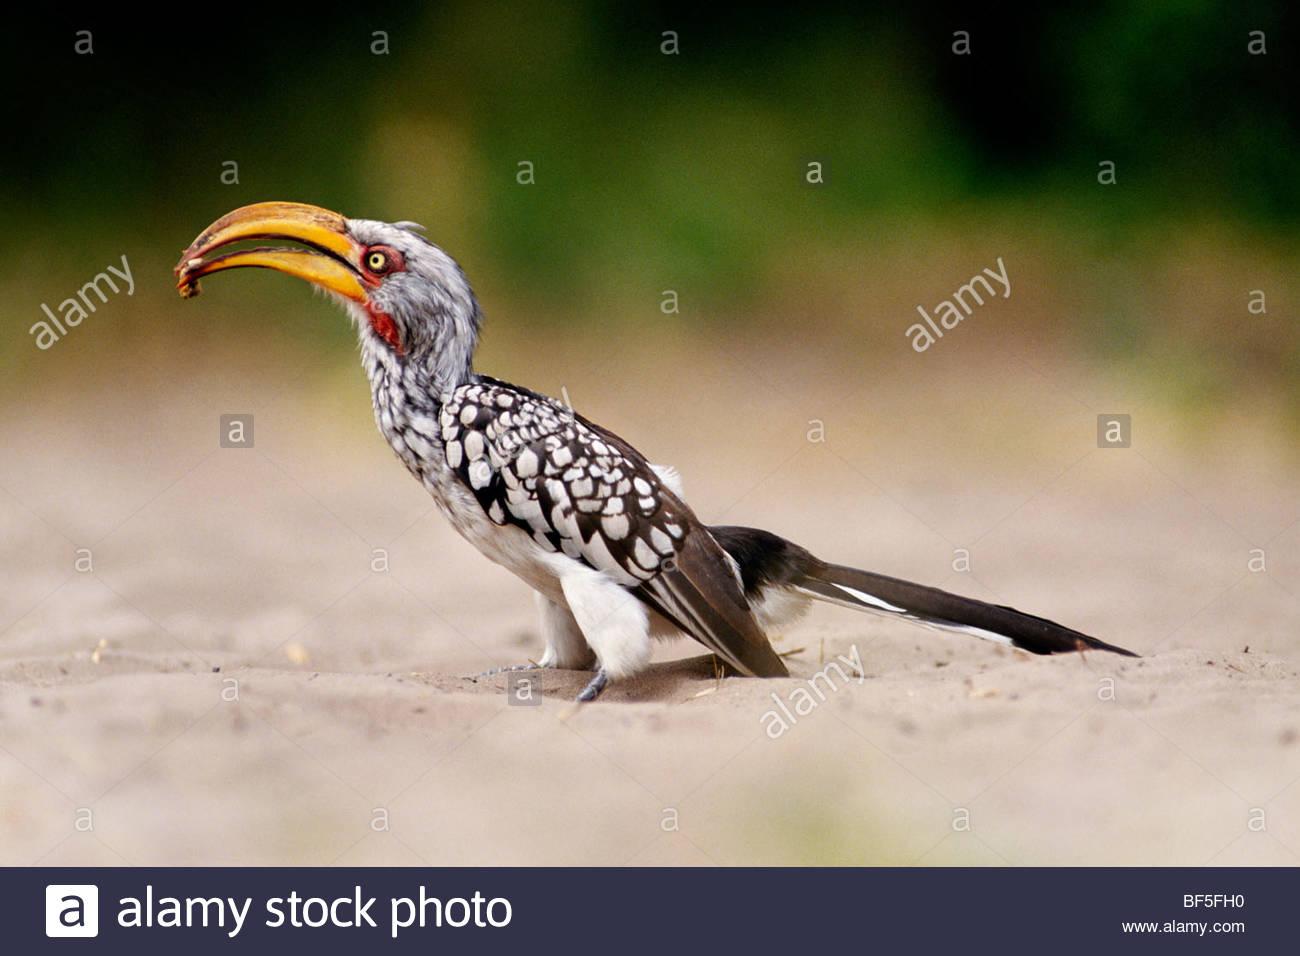 Southern yellow-billed hornbill holding prey, Tockus leucomelas, Savute, Botswana - Stock Image